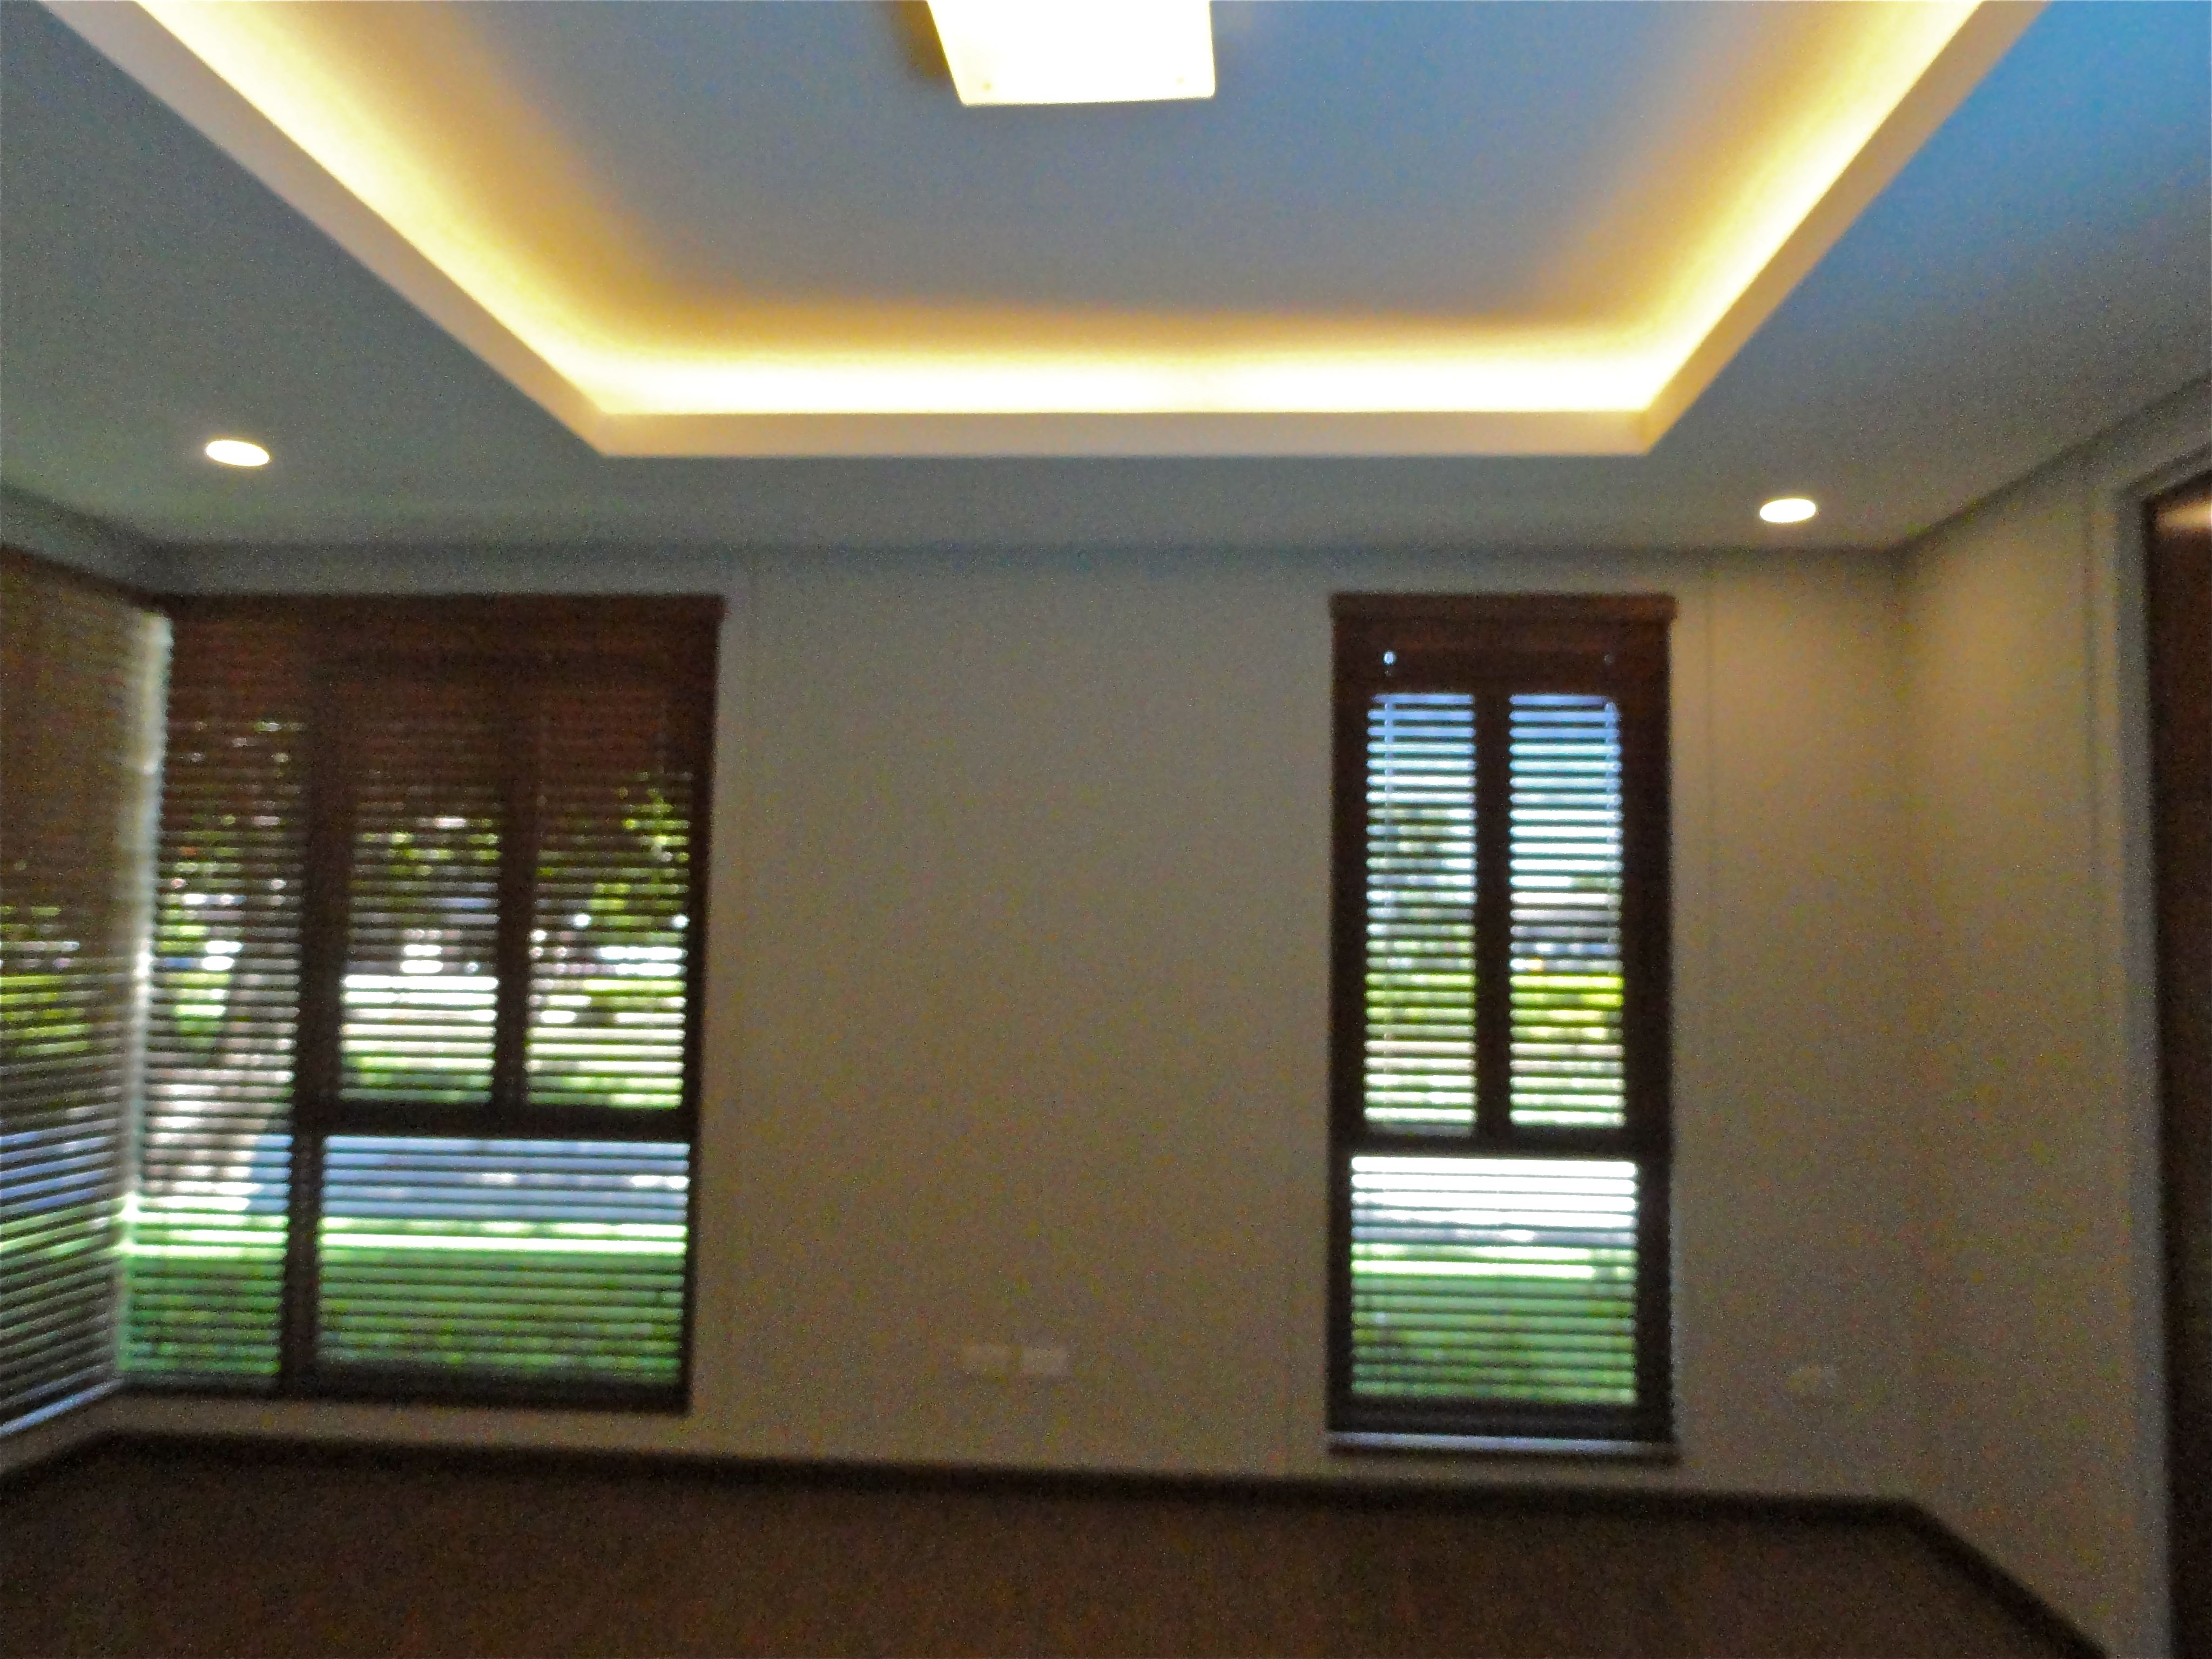 In Der Decke Lichter Leuchten Abgehangte Decke Leuchtet Moderne Kuche Schone Beleuchtung Decken False Ceiling Design Simple False Ceiling Design False Ceiling